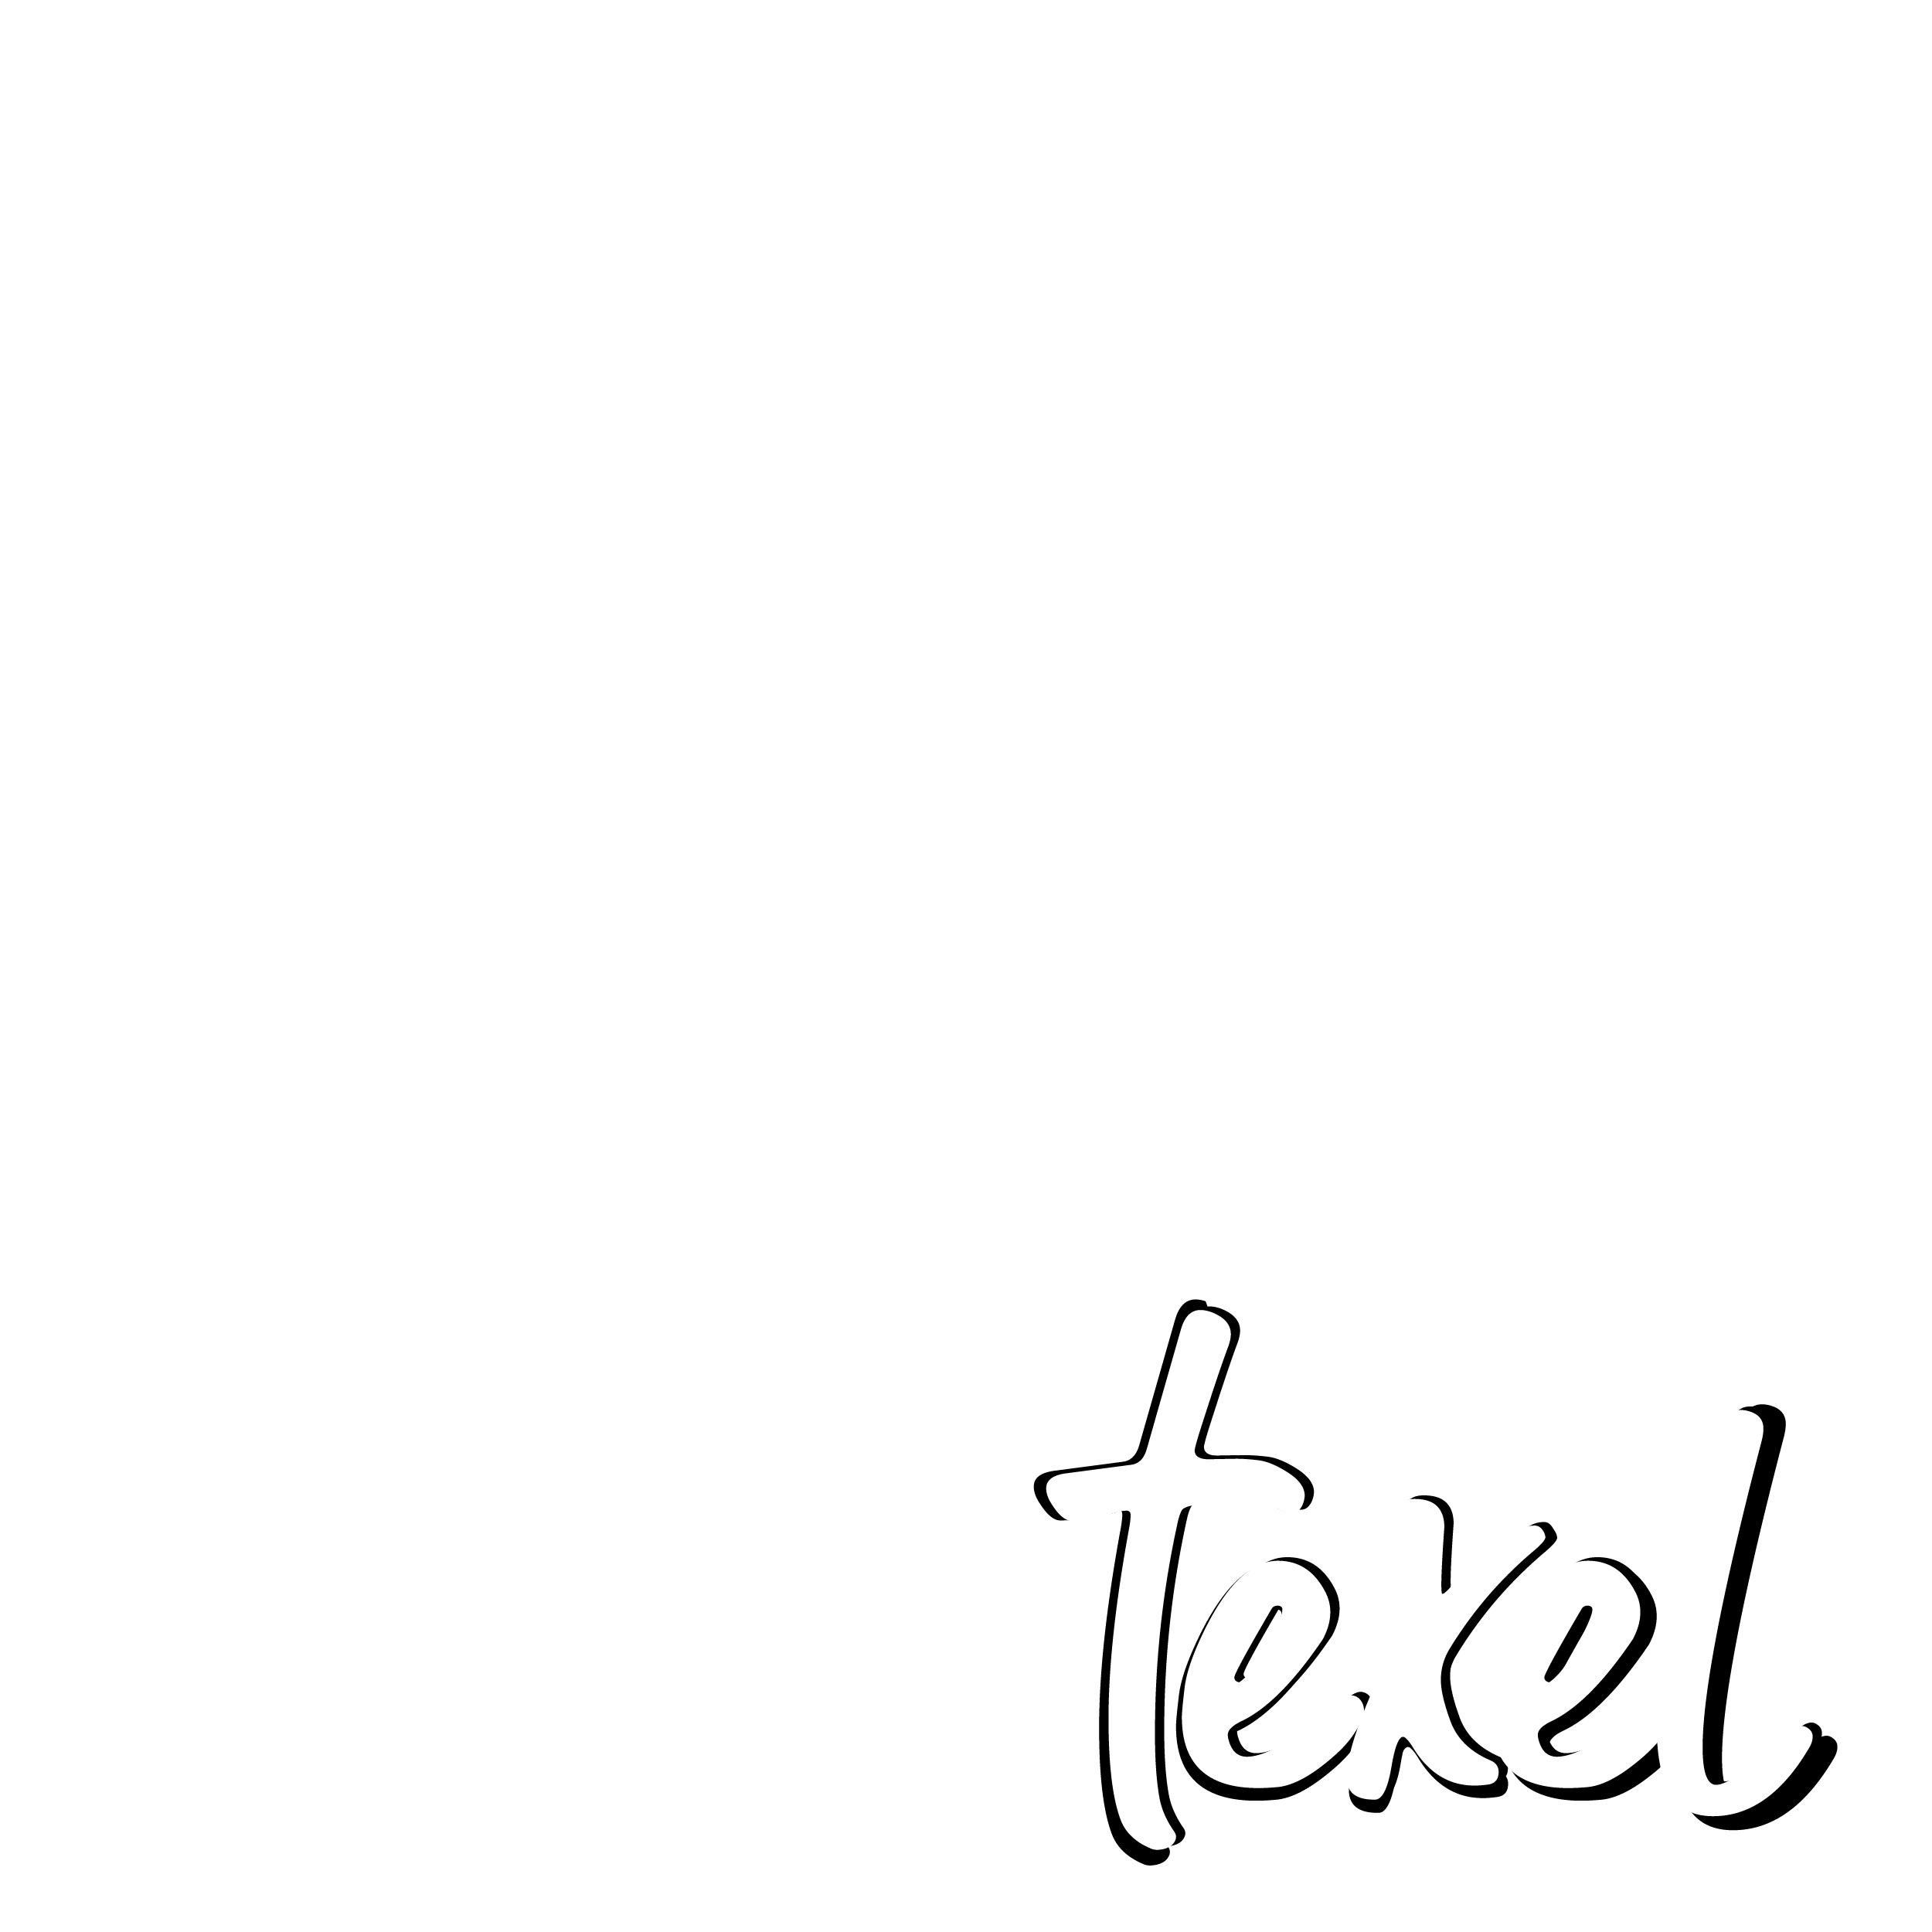 Quiksurf